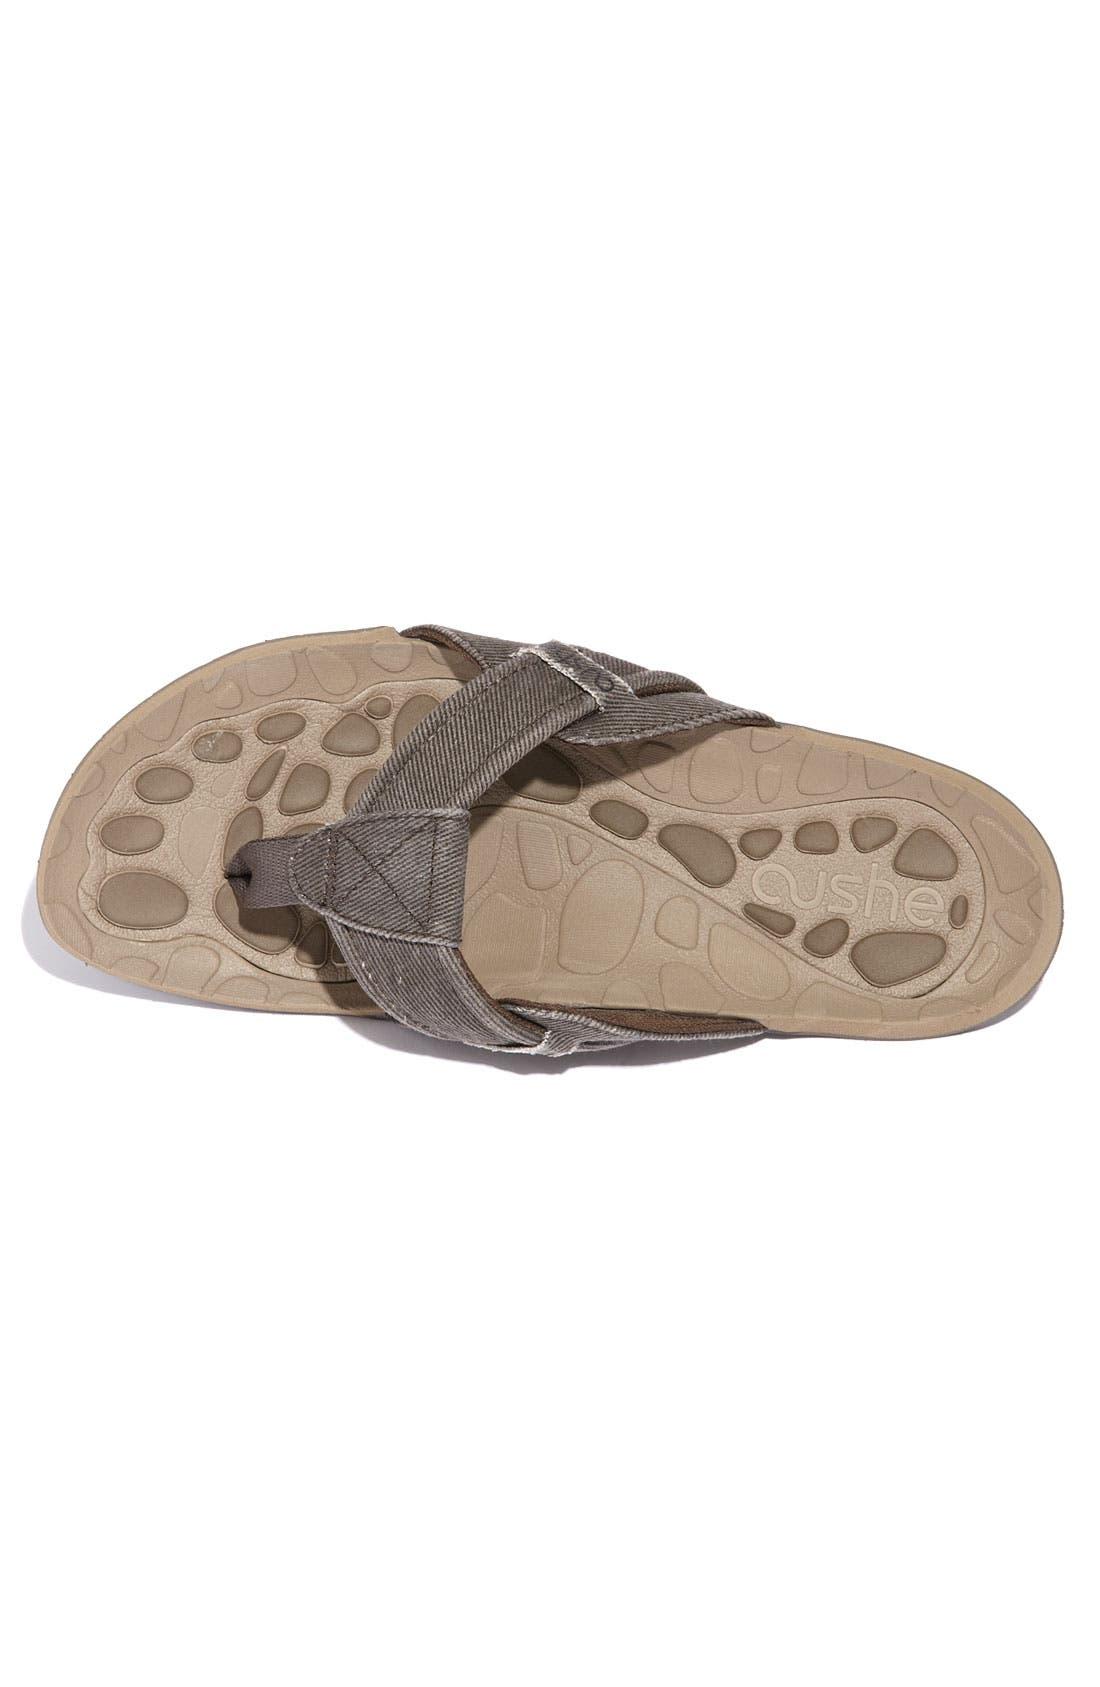 Alternate Image 3  - Cushe 'Evo Webb' Flip Flop